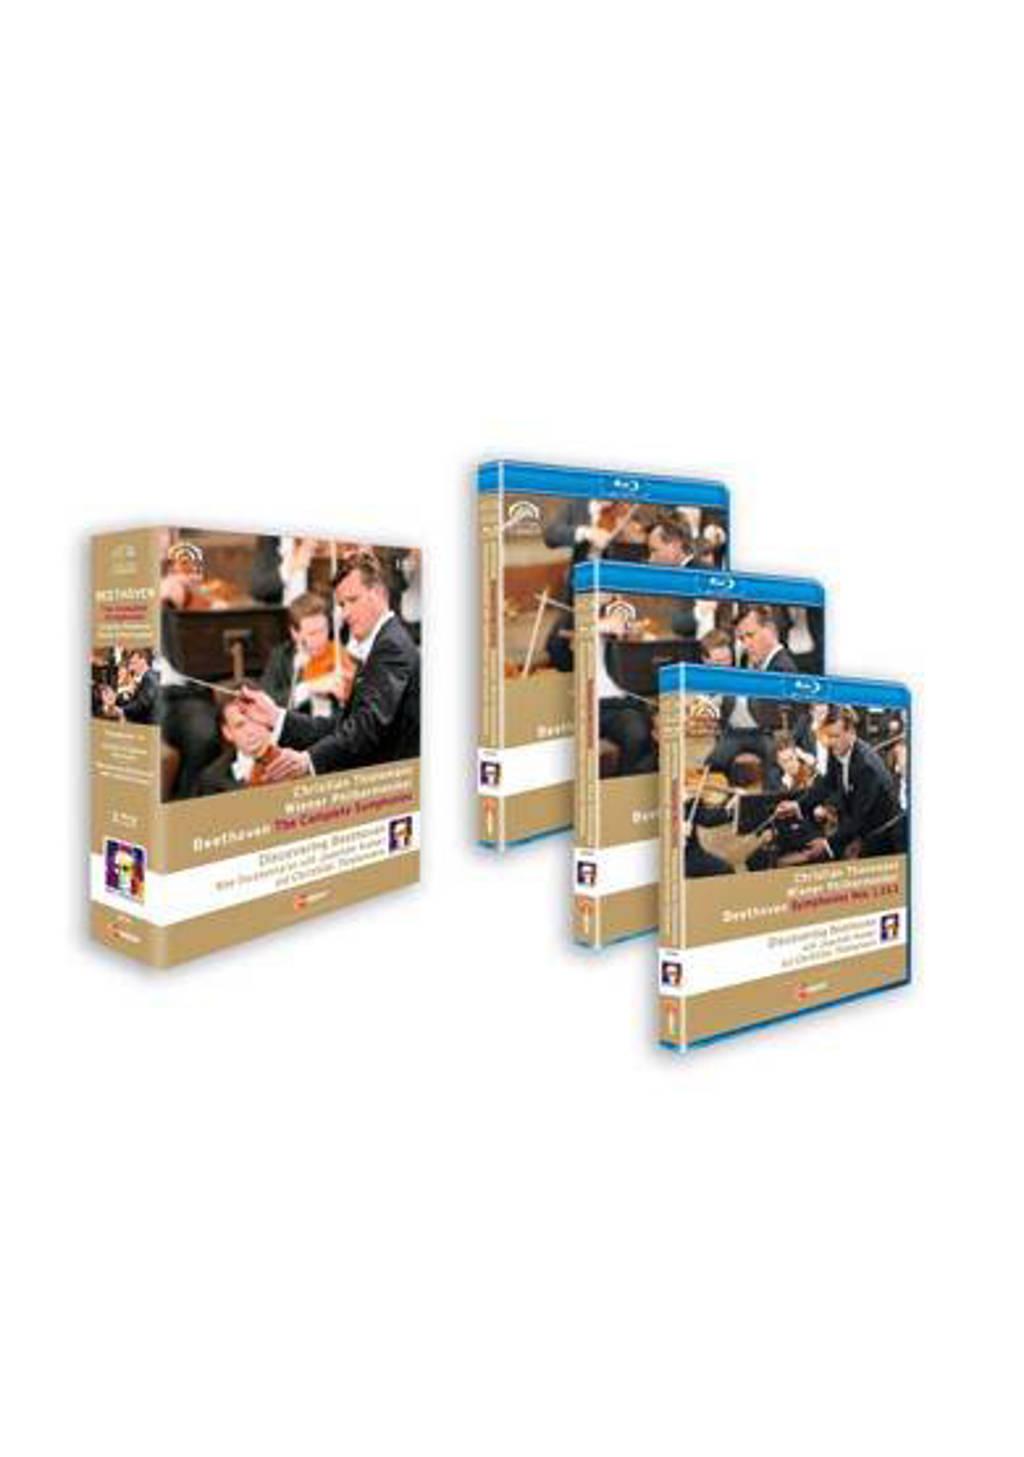 Wiener Philharmoniker - Thielemann Beethoven Sym.1-9 Br Box (Blu-ray)